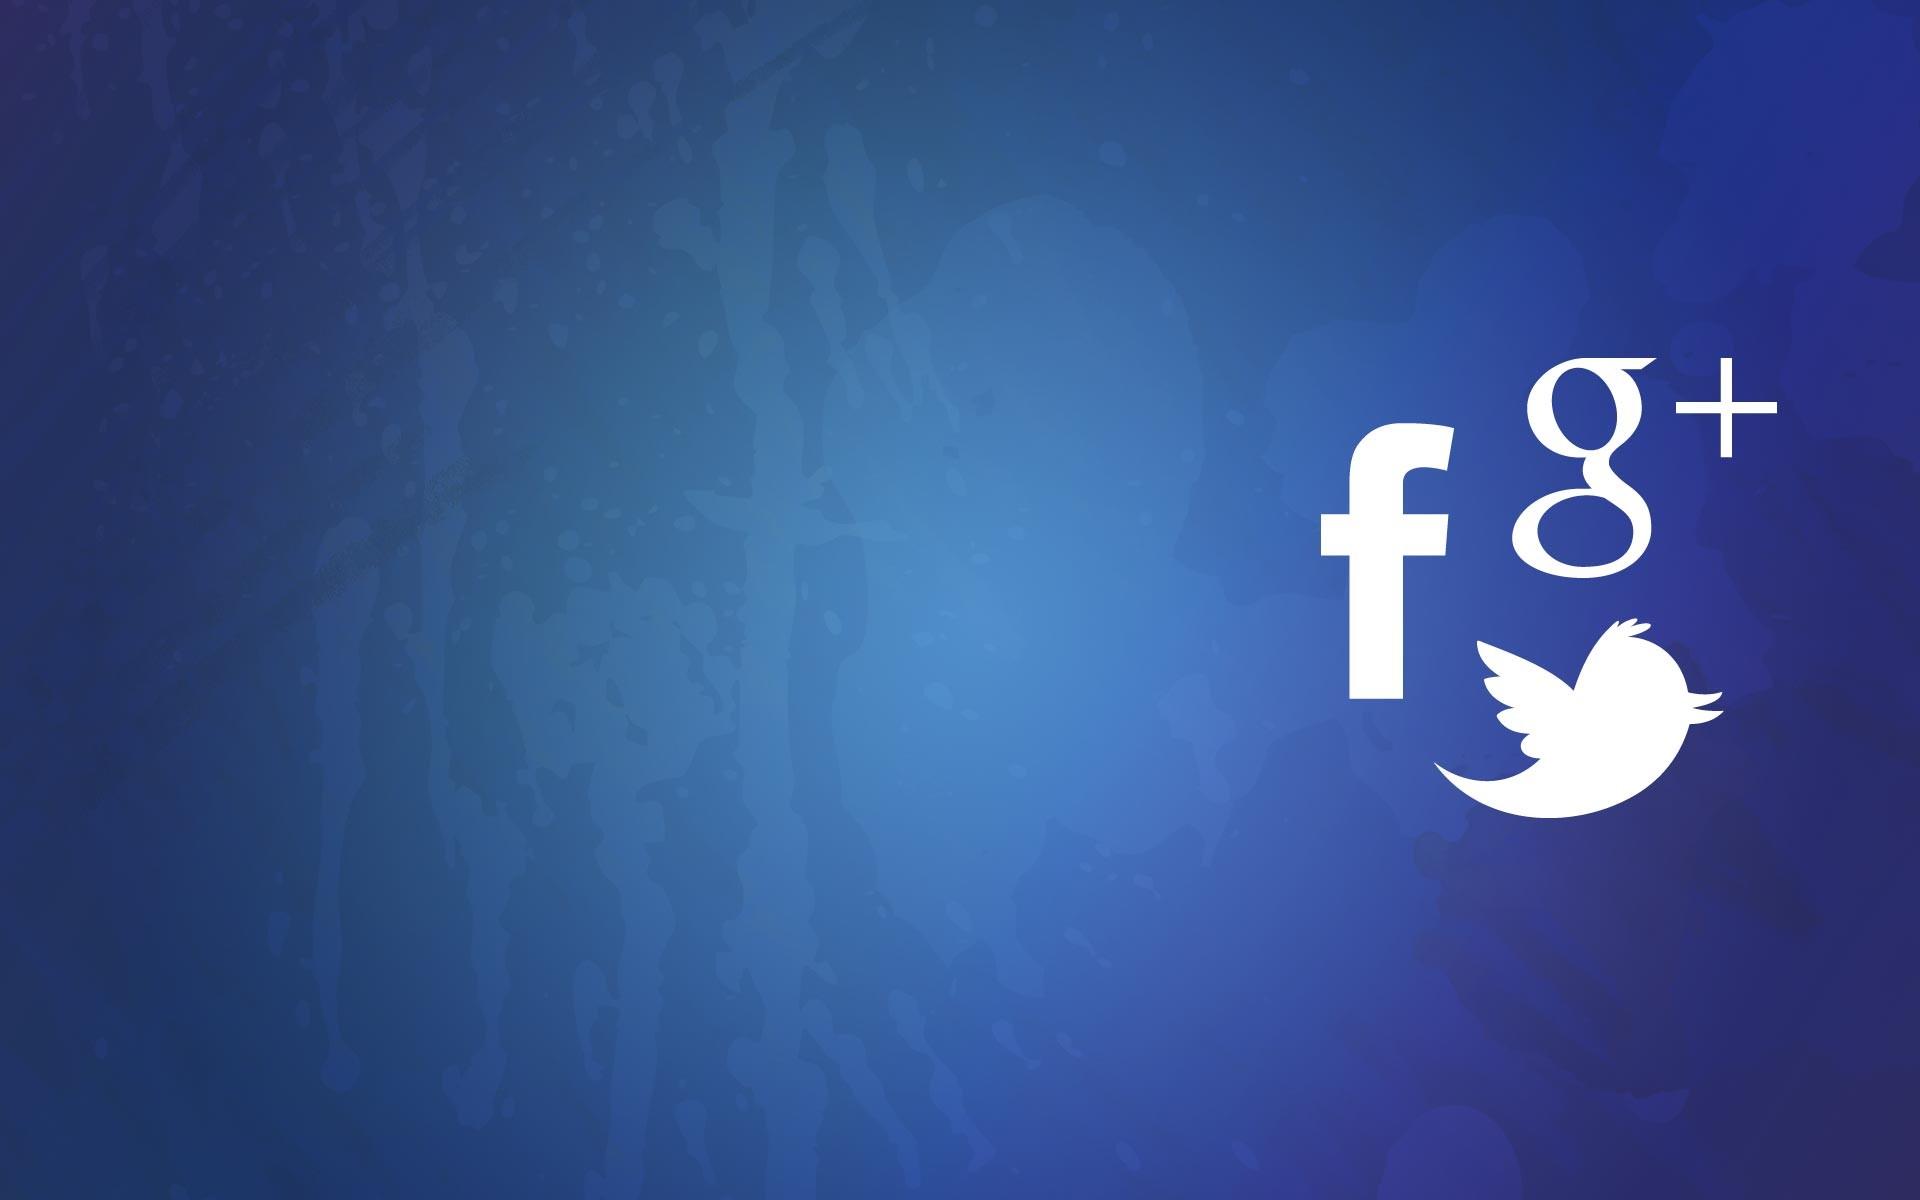 Social Media Wallpaper Backgrounds #20462 Wallpaper | WallpapersTube .